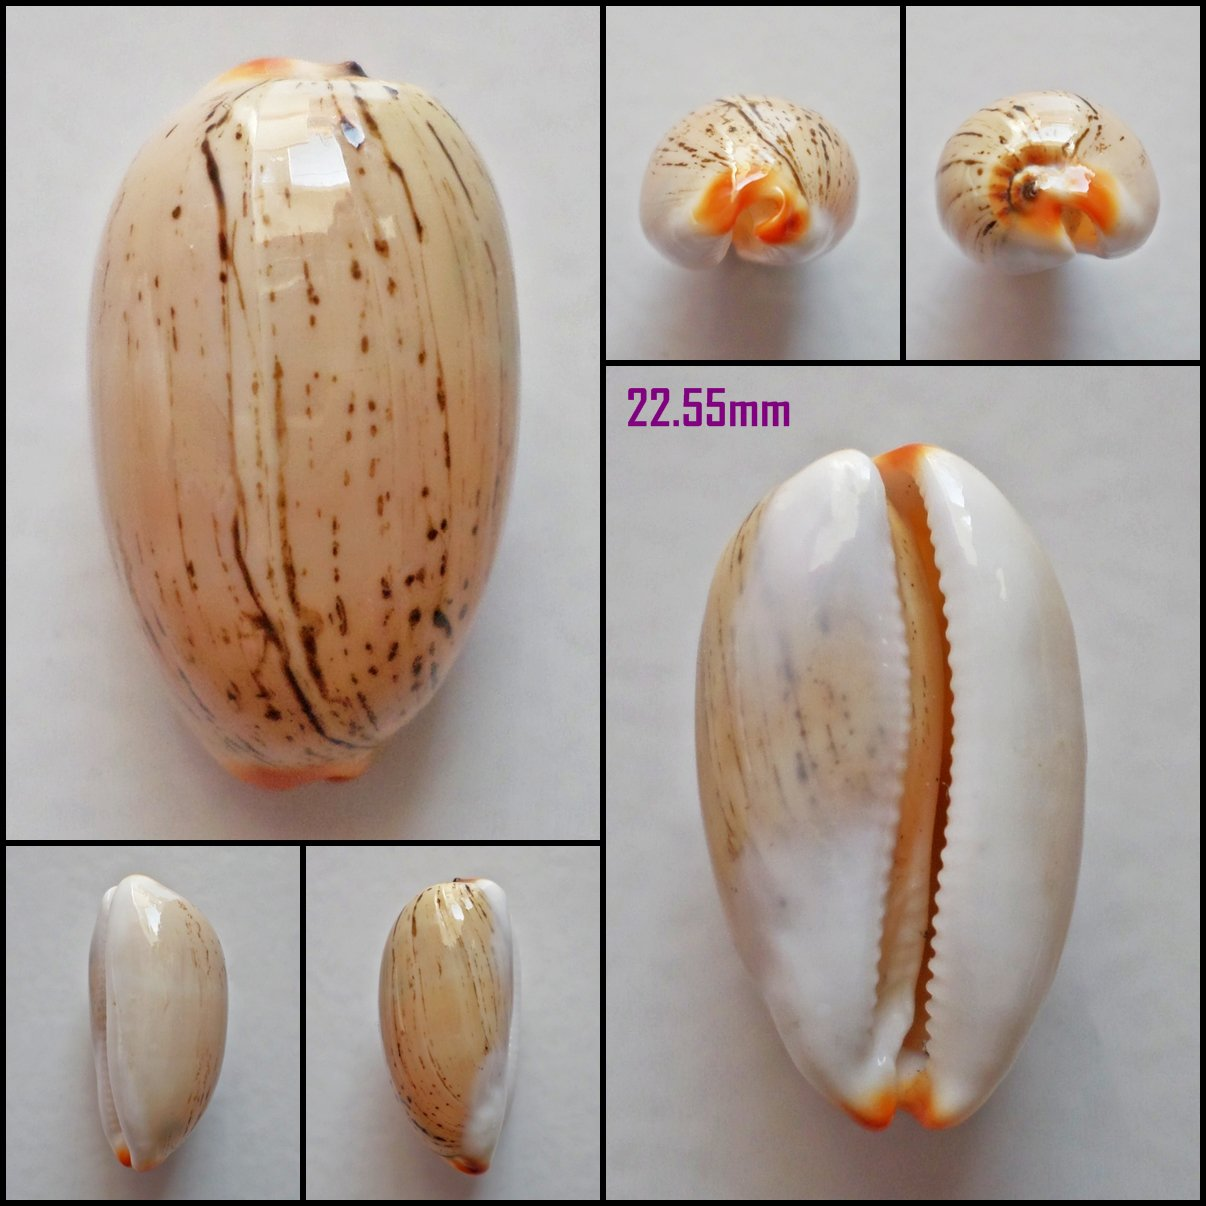 AFA18 - Luria isabella 22.55mm